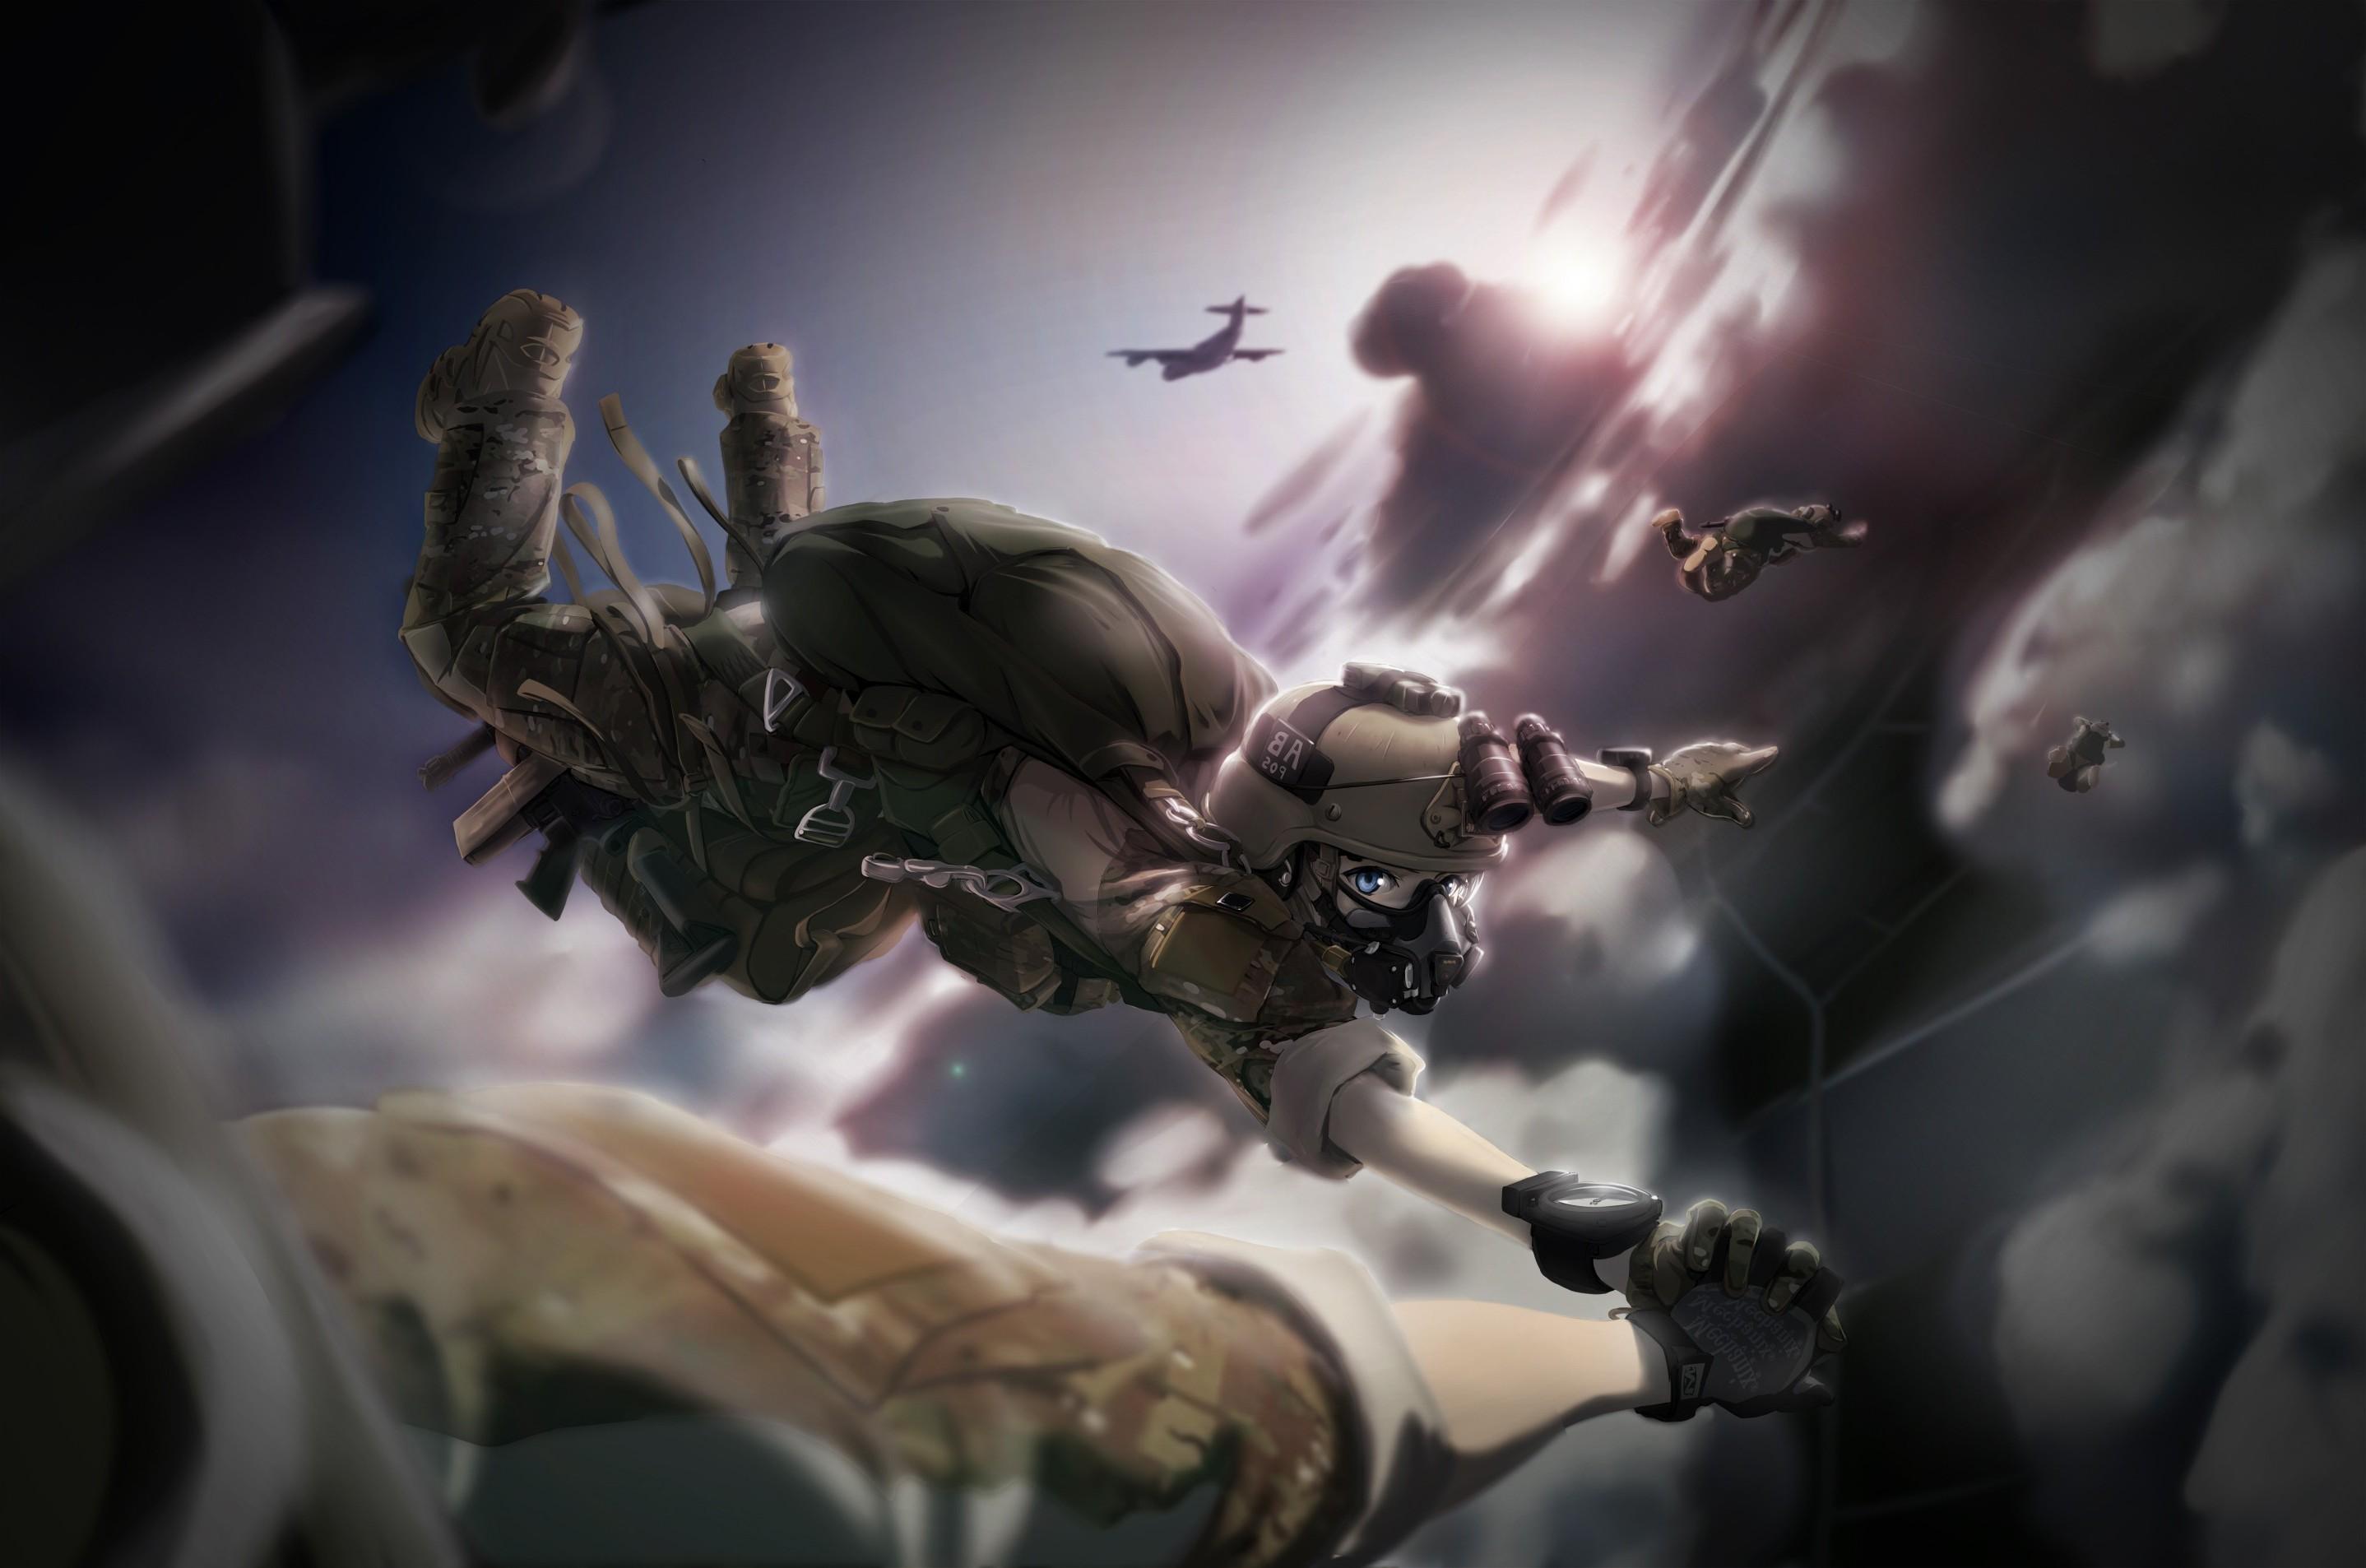 Girl With Guns Hd Wallpapers Wallpaper Anime Girls Military Mythology Tc1995 Sky